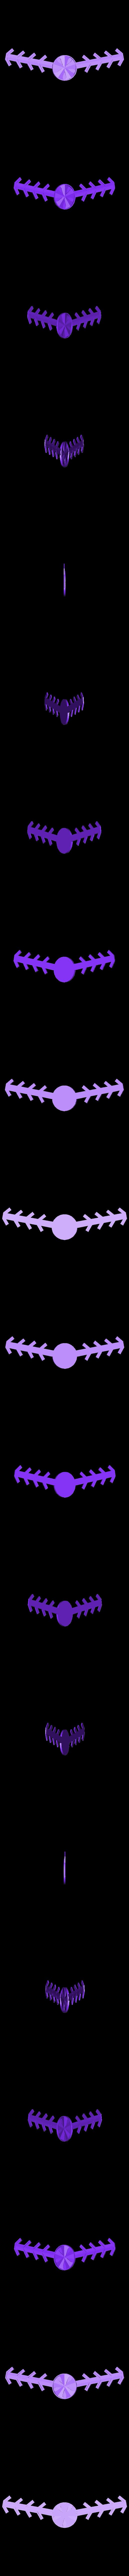 Quincy Vollständig Ear Saver.stl Download free STL file Quincy: Vollständig Ear Saver • 3D printer model, espire020